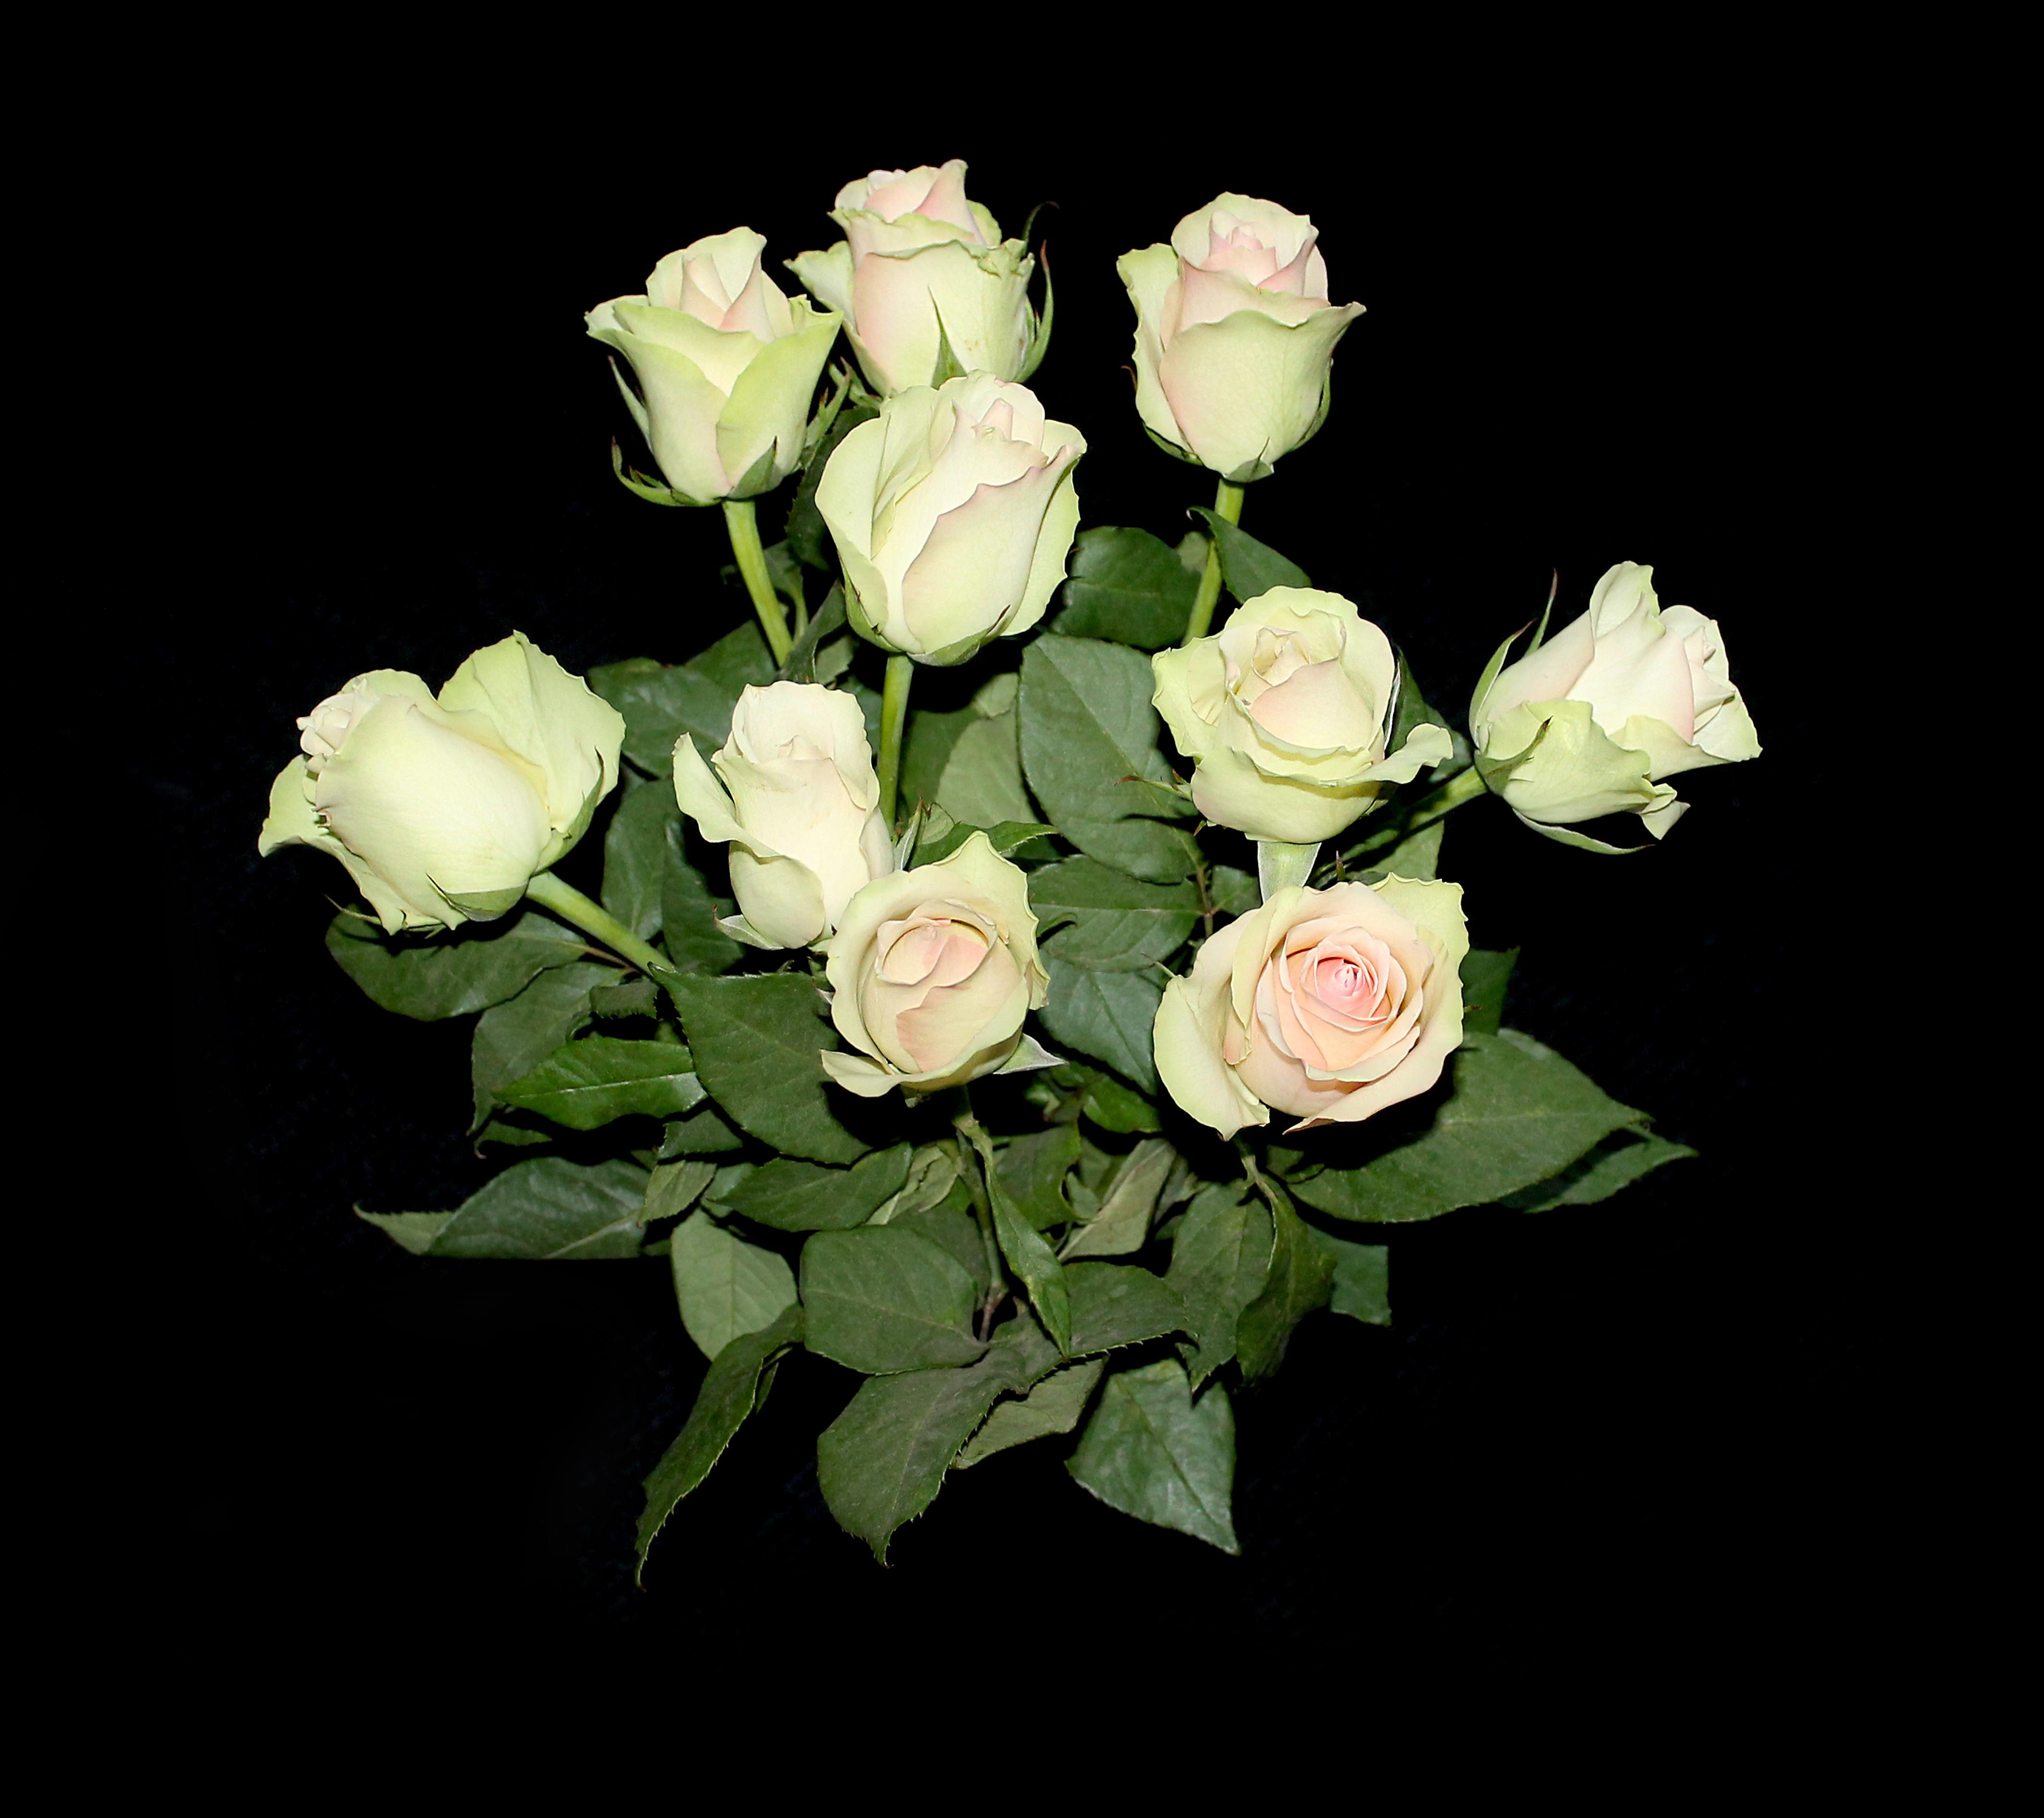 Garden Roses Flower Petal: Free Images : White, Petal, Love, Romance, Flora